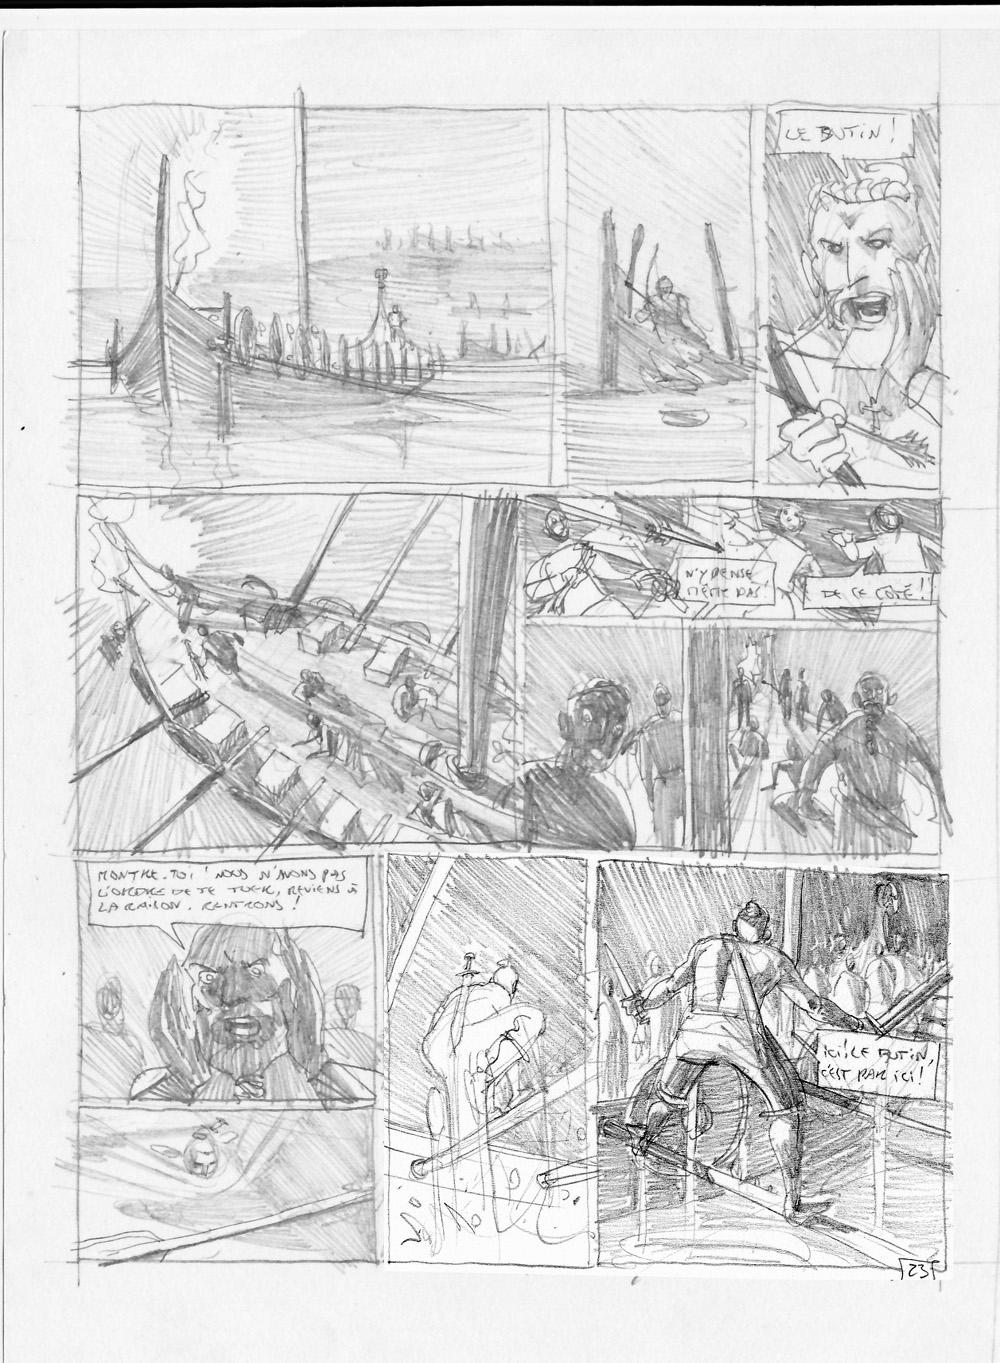 Sigurd & Vigdis, storyboard de la planche 23 © Benoît Blary